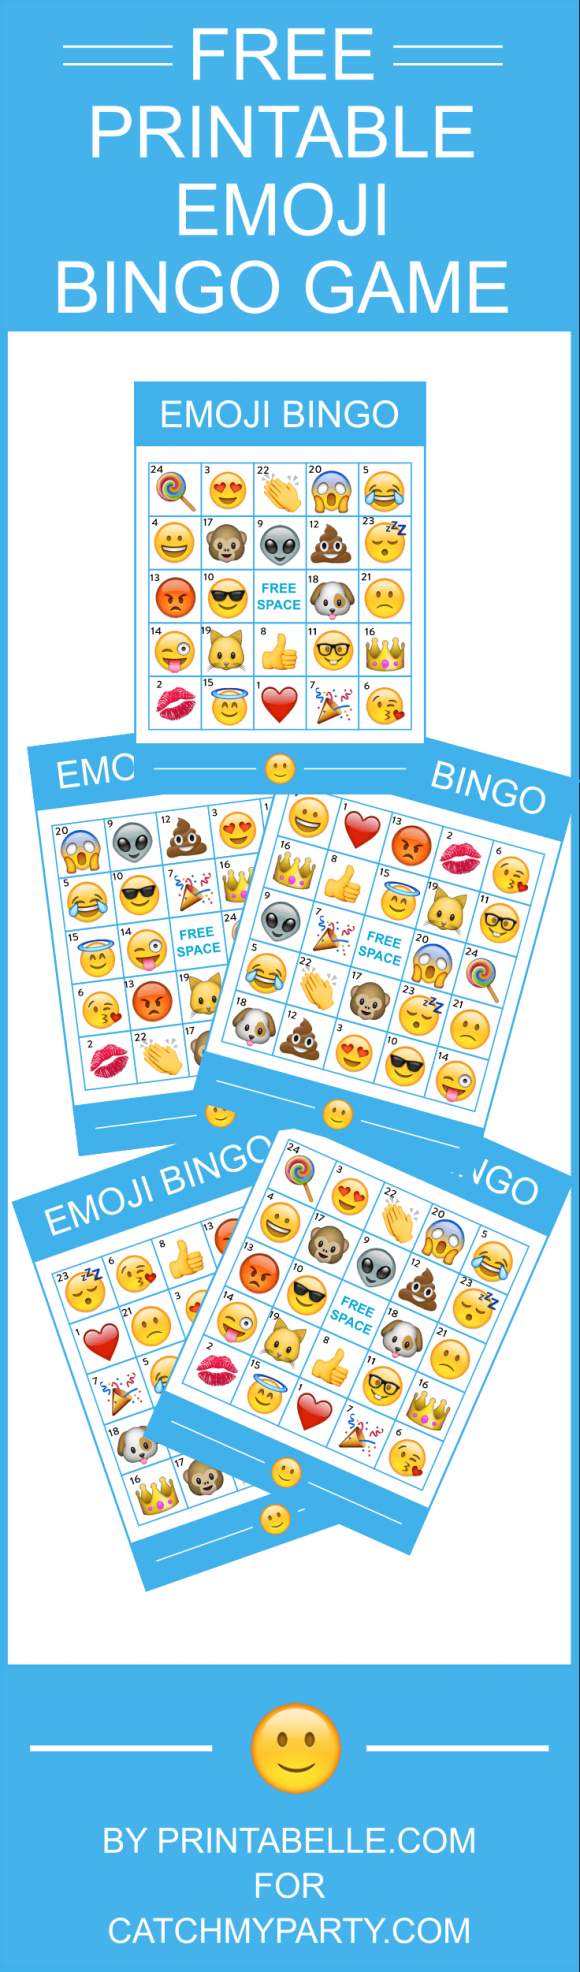 Free Printable Emoji Bingo Game -- Comes With 8 Bingo Cards